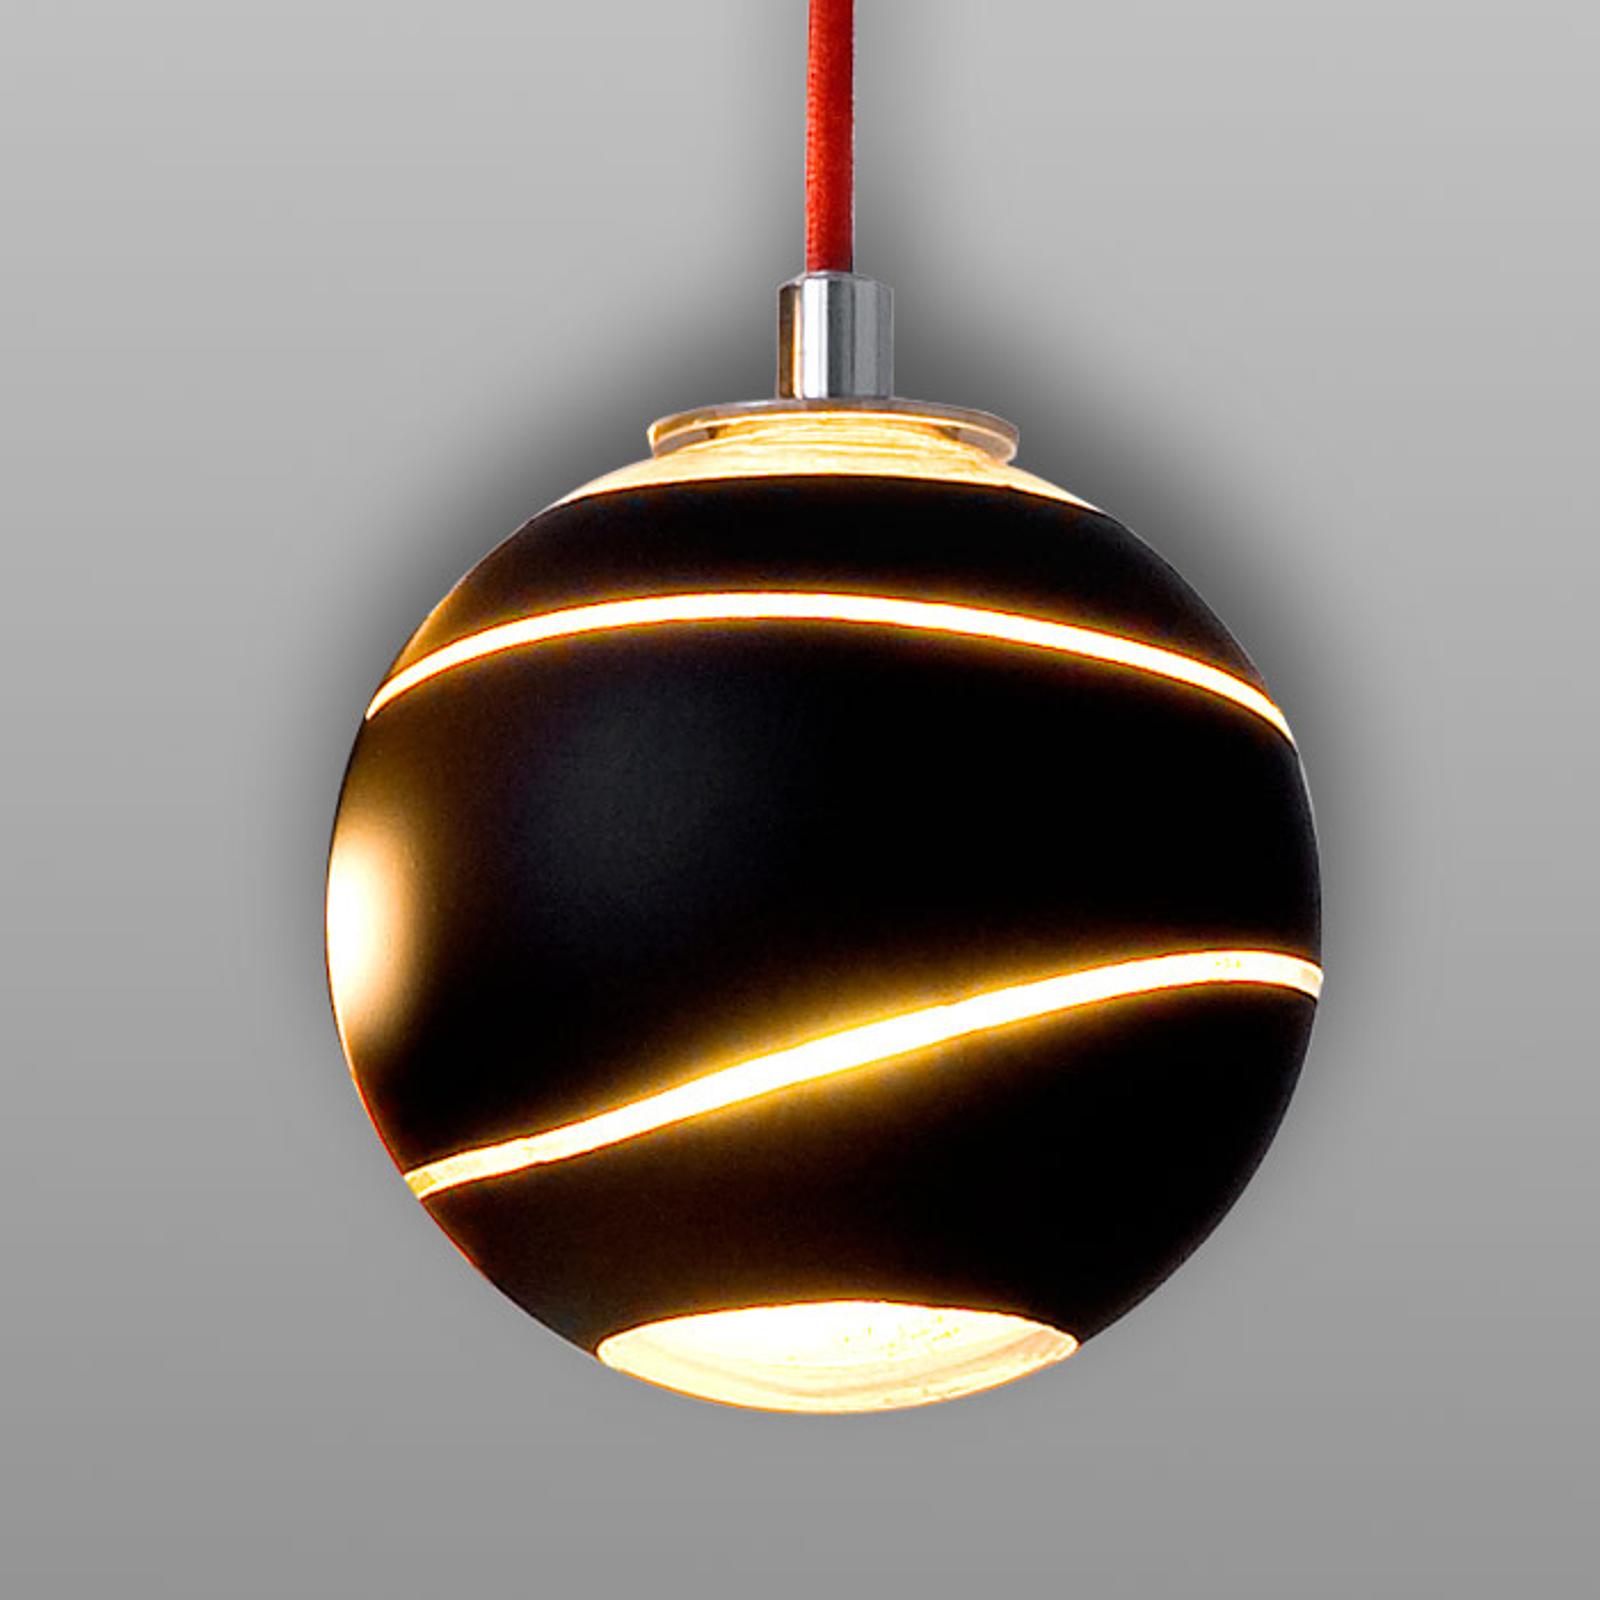 Liten hengelampe Bond, svart, 12 cm